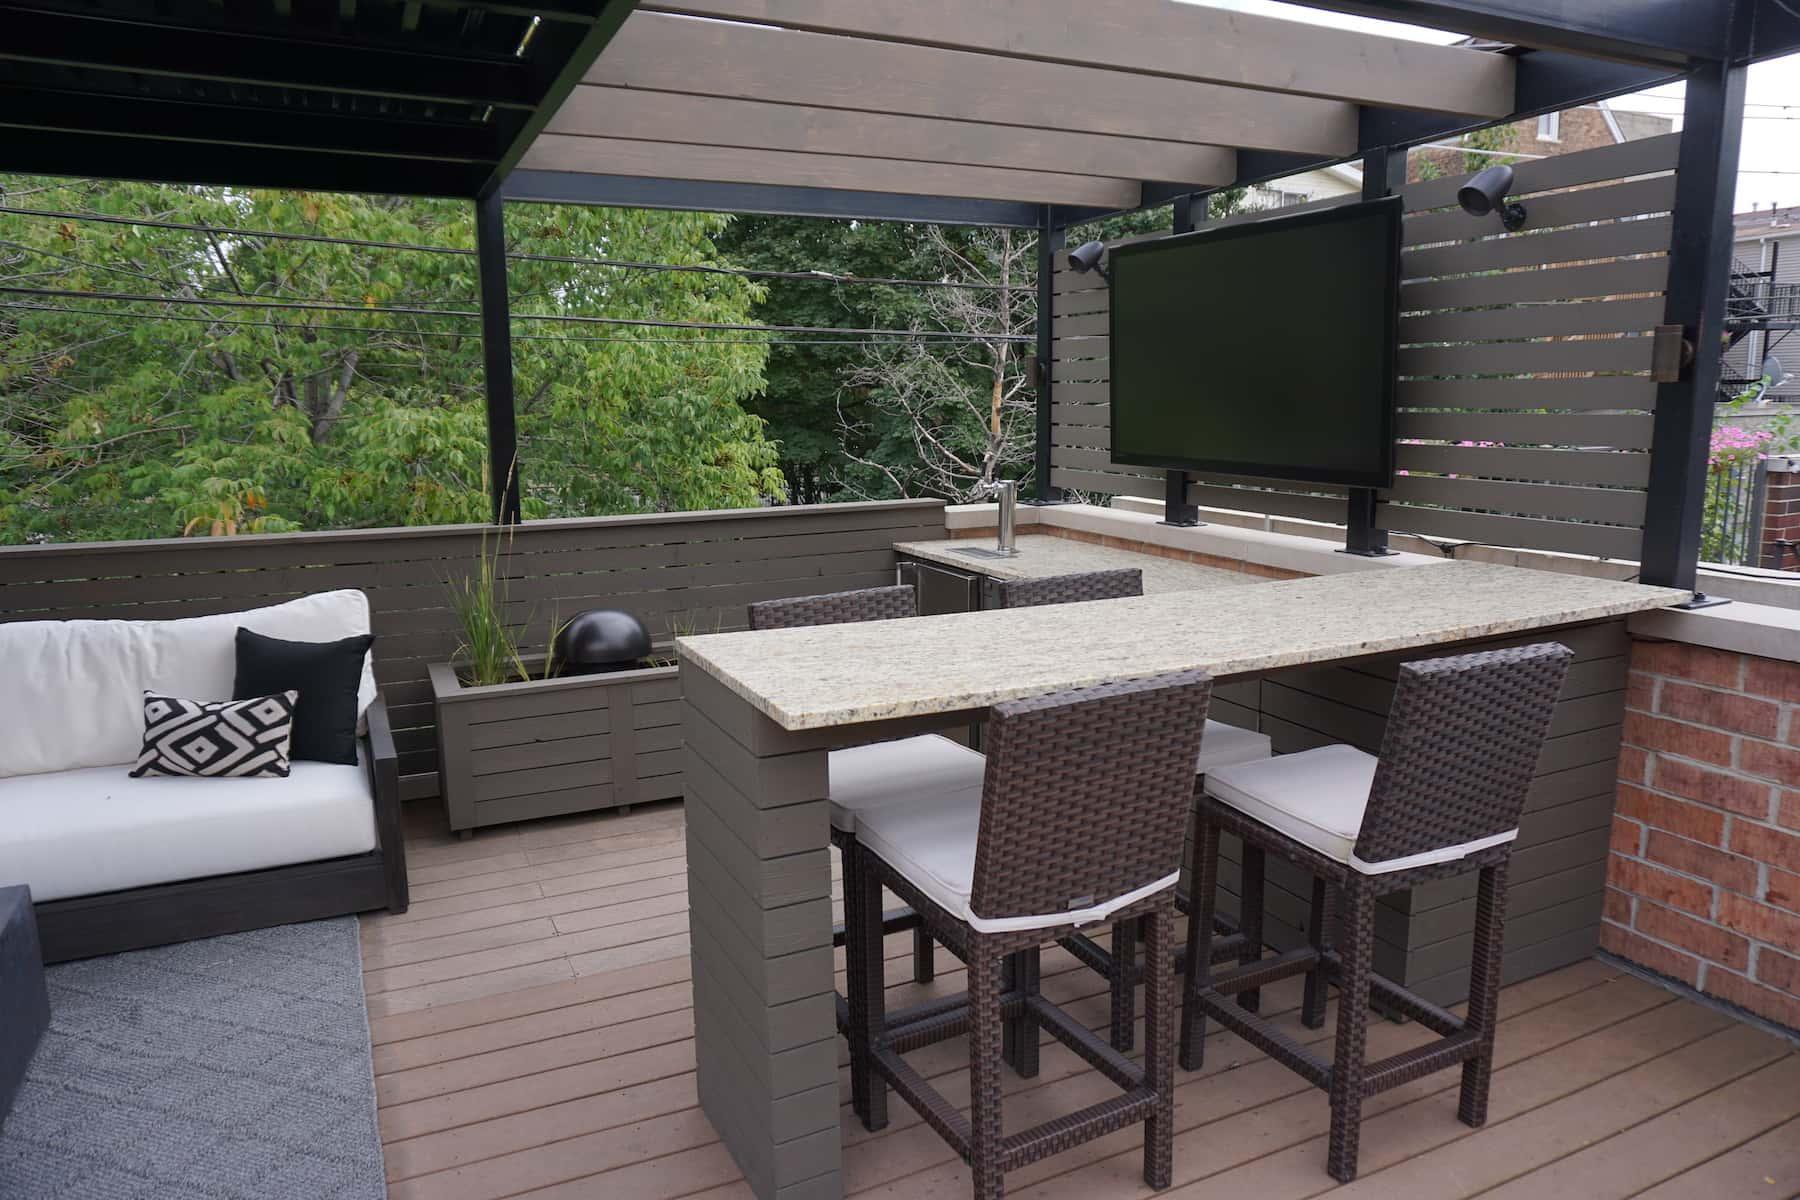 Rooftop Deck With Amenities Chicago Roof Decks